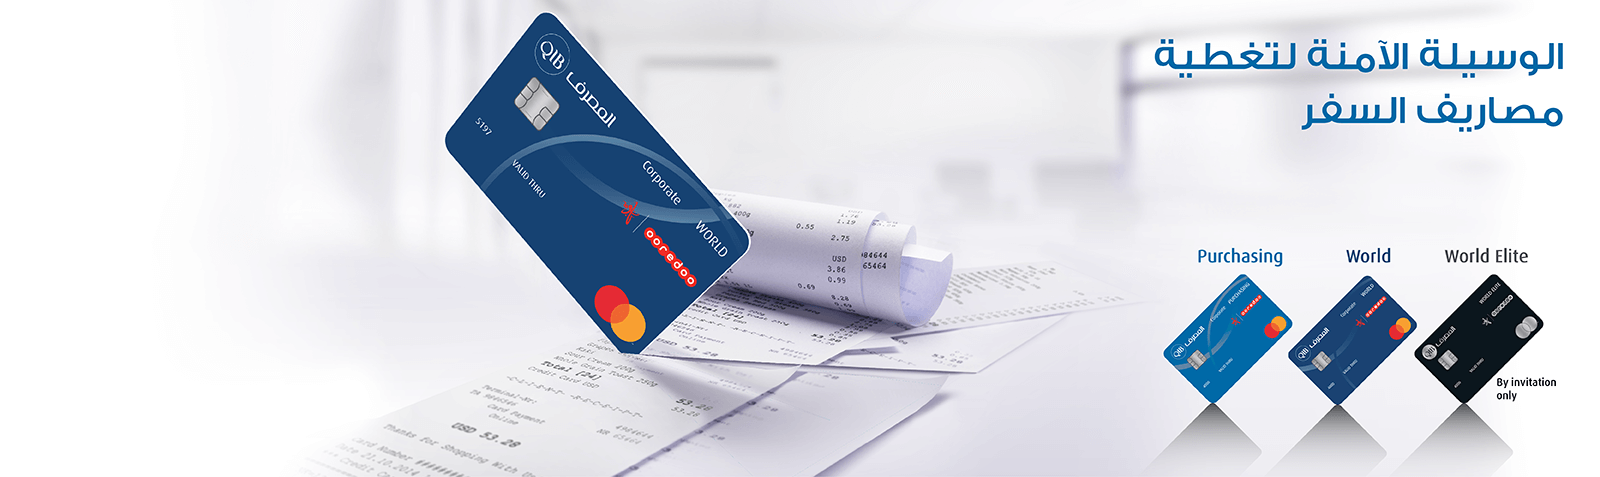 ar-co-branded-corporate-world-card